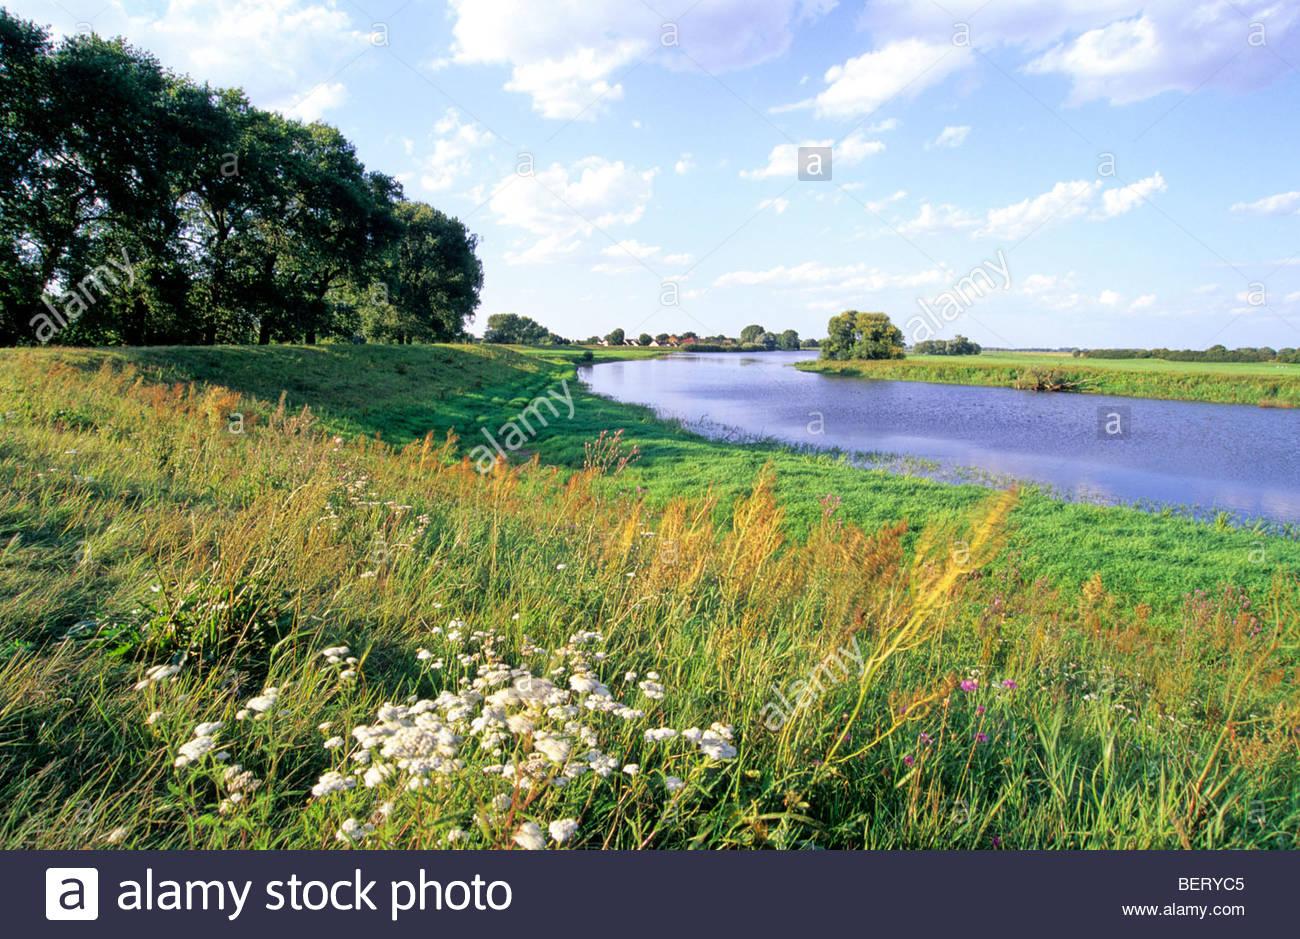 cut-off meander, floodplains river Elbe, B sewig, Germany - Stock Image